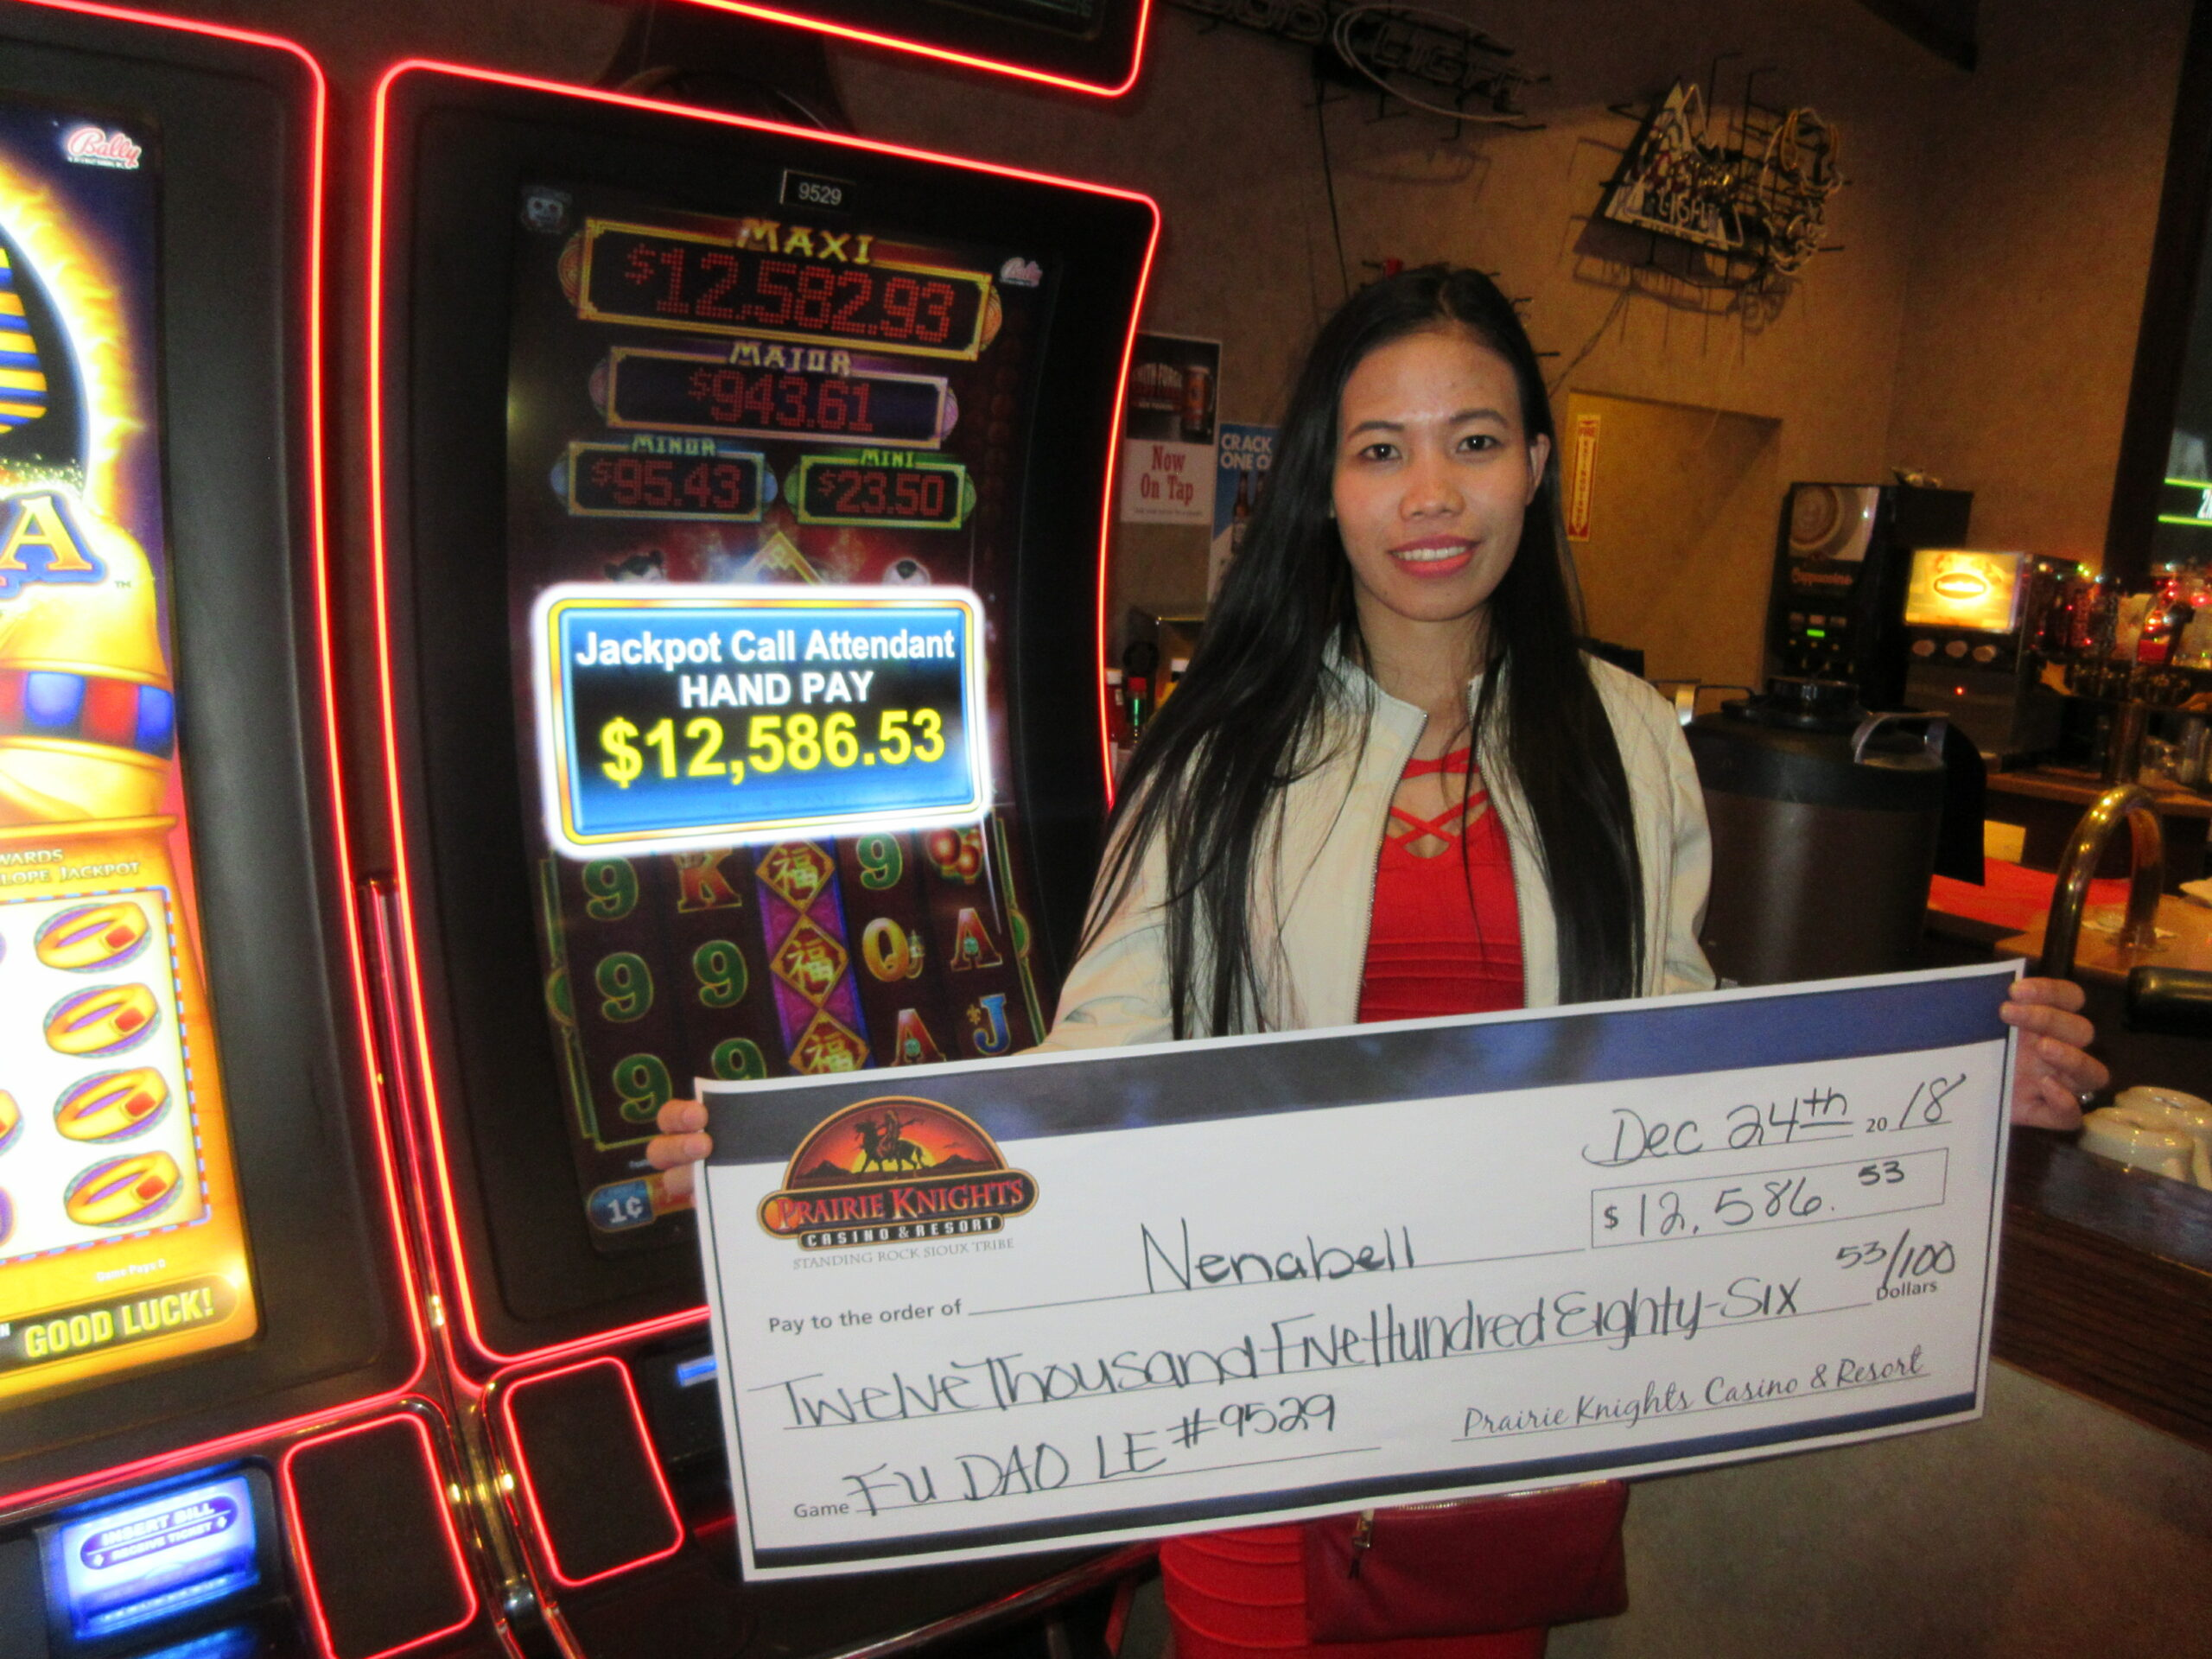 Nenabell – $12,586